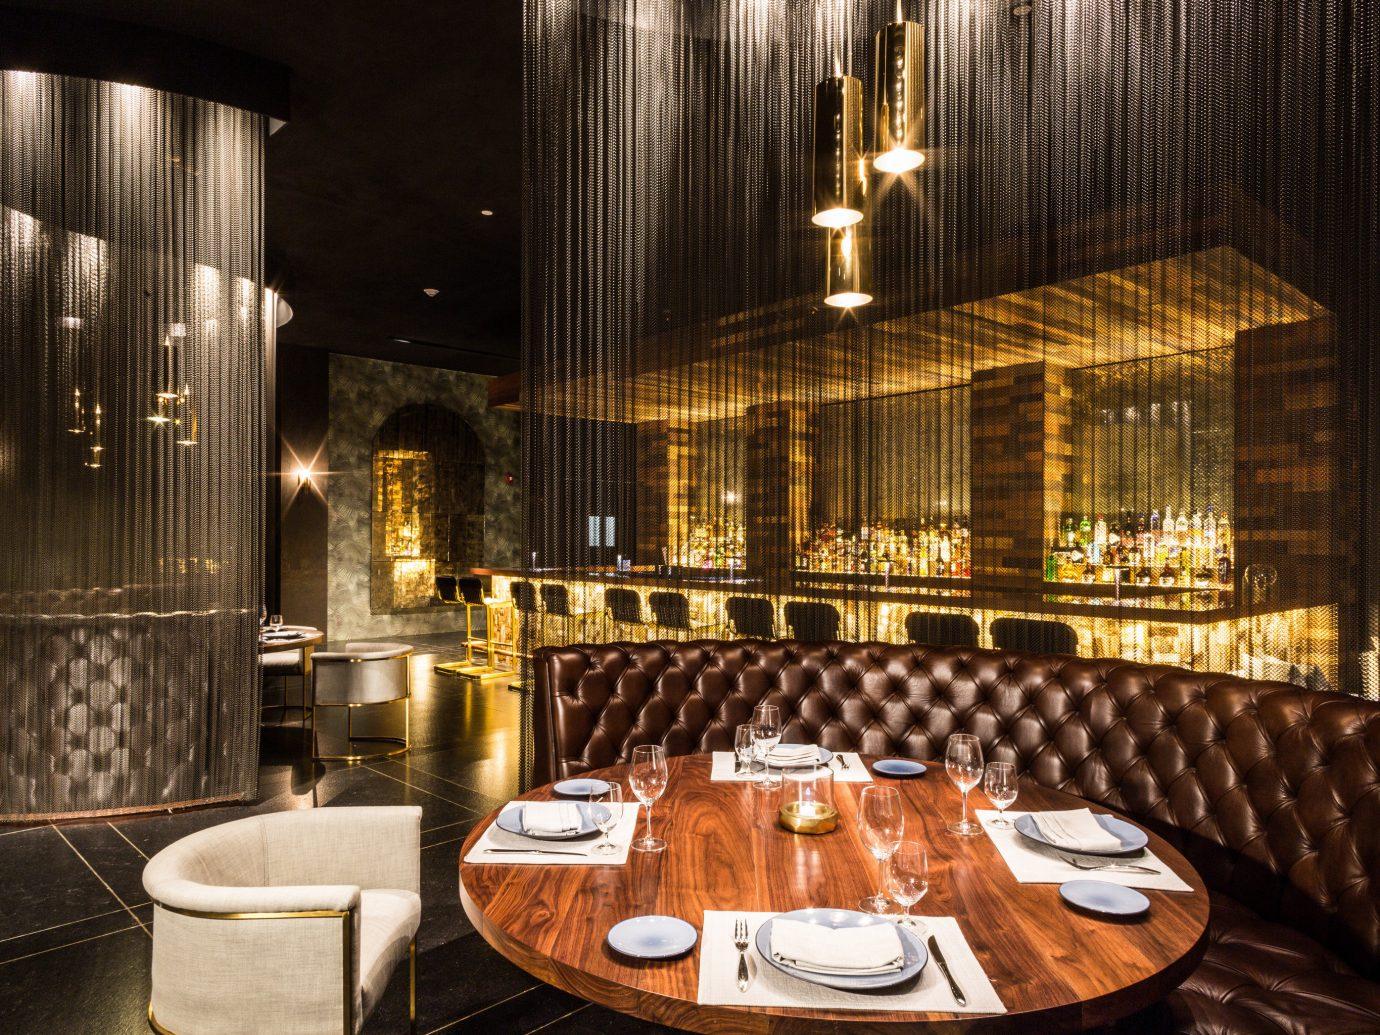 Hotels table indoor window Lobby estate interior design restaurant Bar dining table